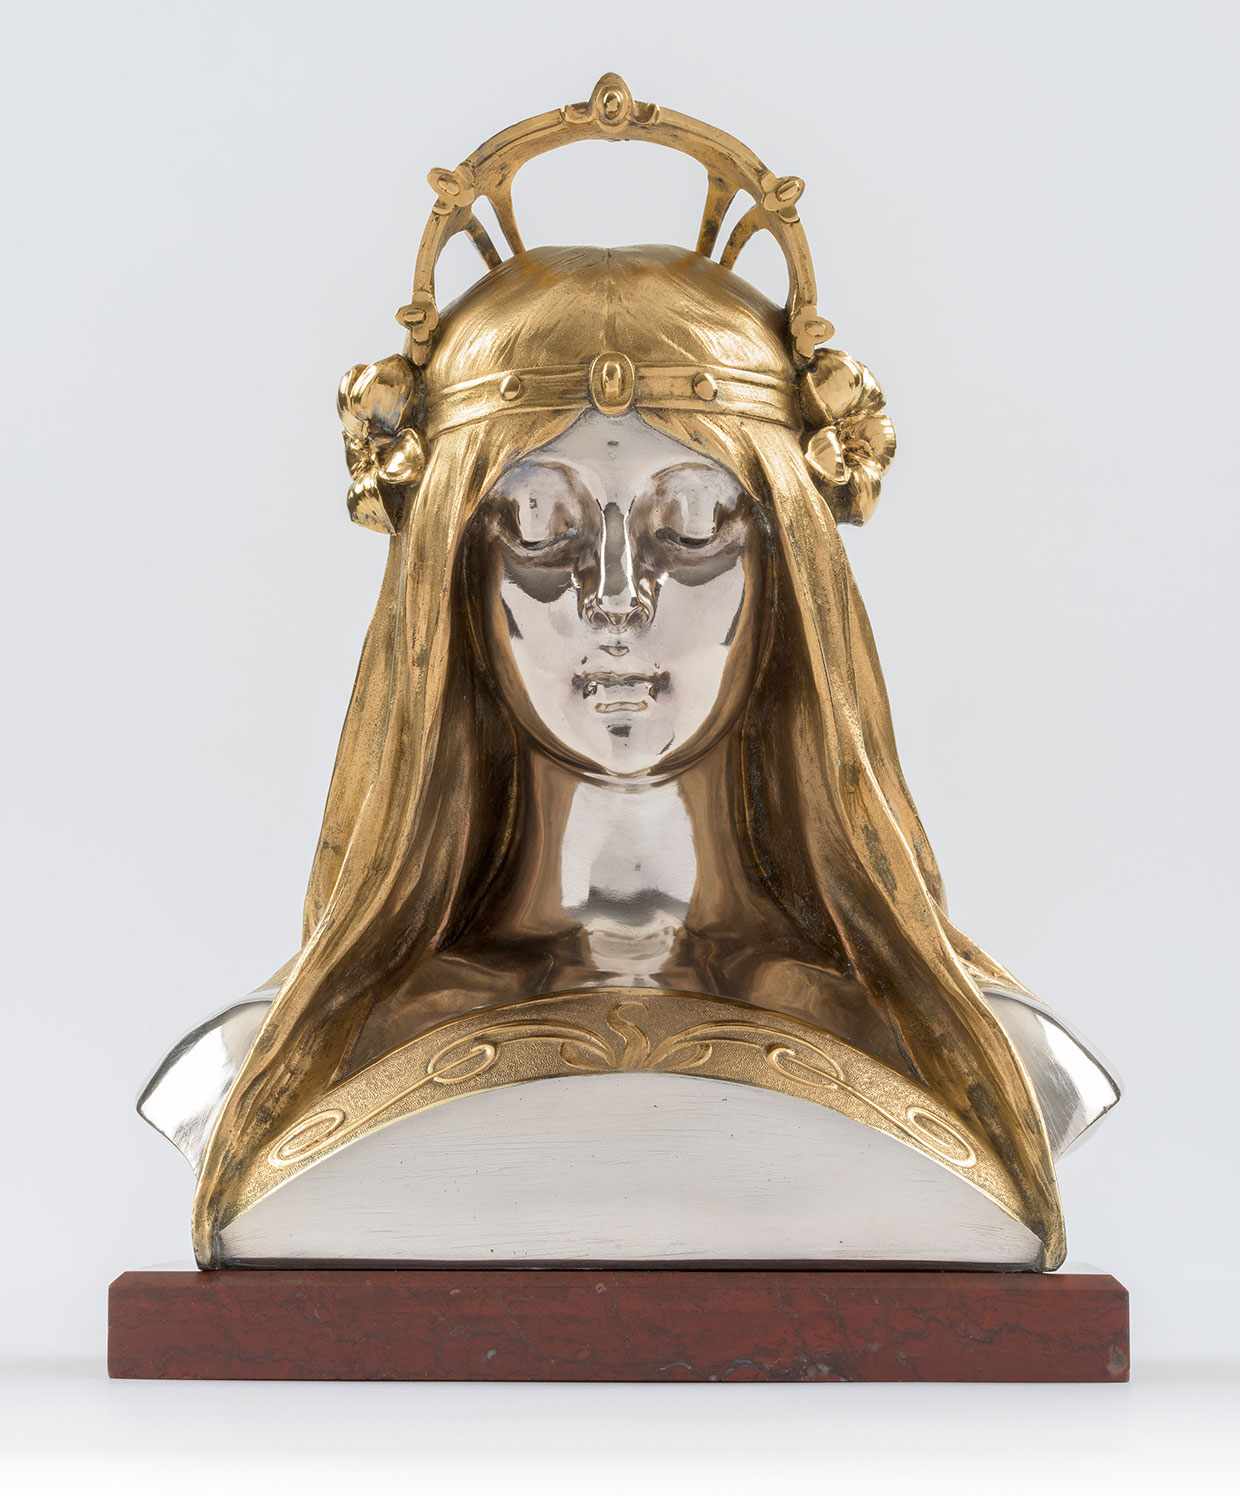 Alphonse Mucha, Pigehoved lavet til parfumeriet Houbigants stand på Verdensudstillingen i Paris © Mucha Trust 2018